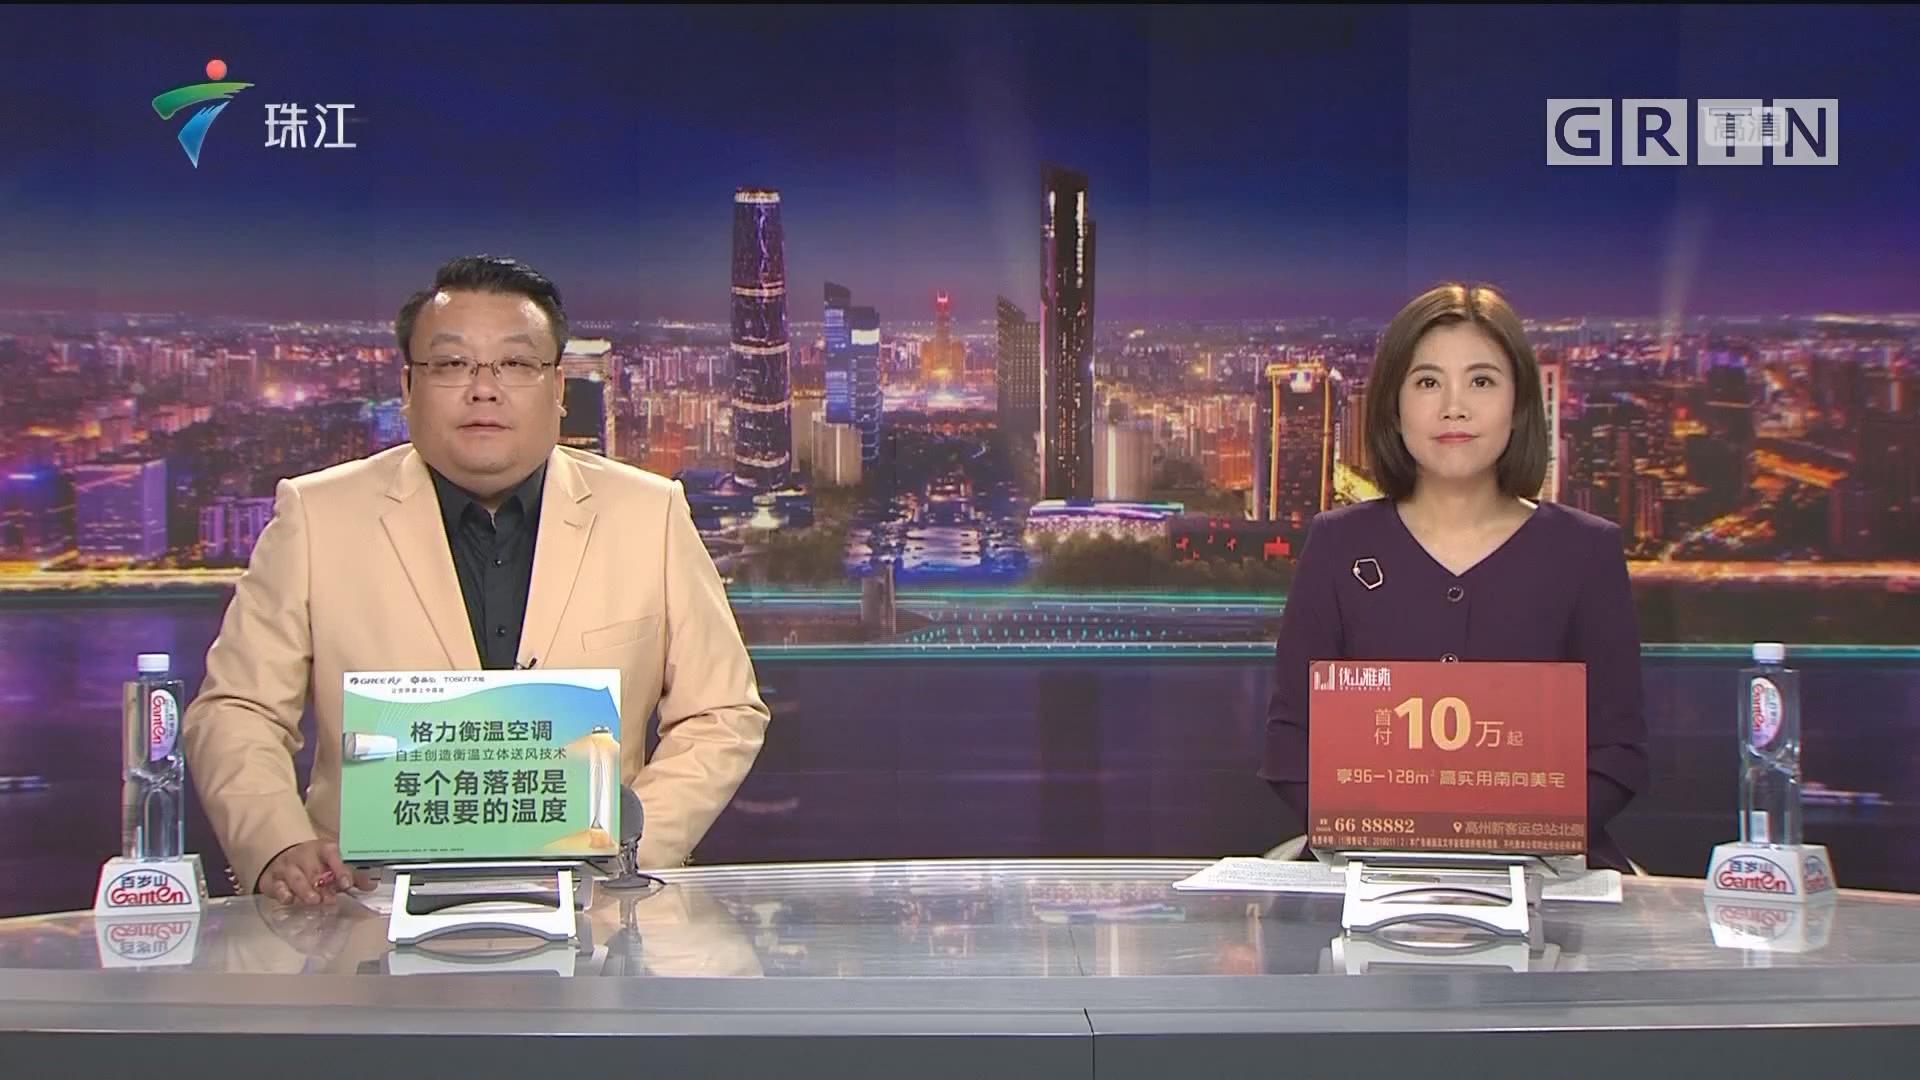 [HD][2019-09-11]今日关注:广州:村民担心百年古树被砍伐 相关部门介入调查